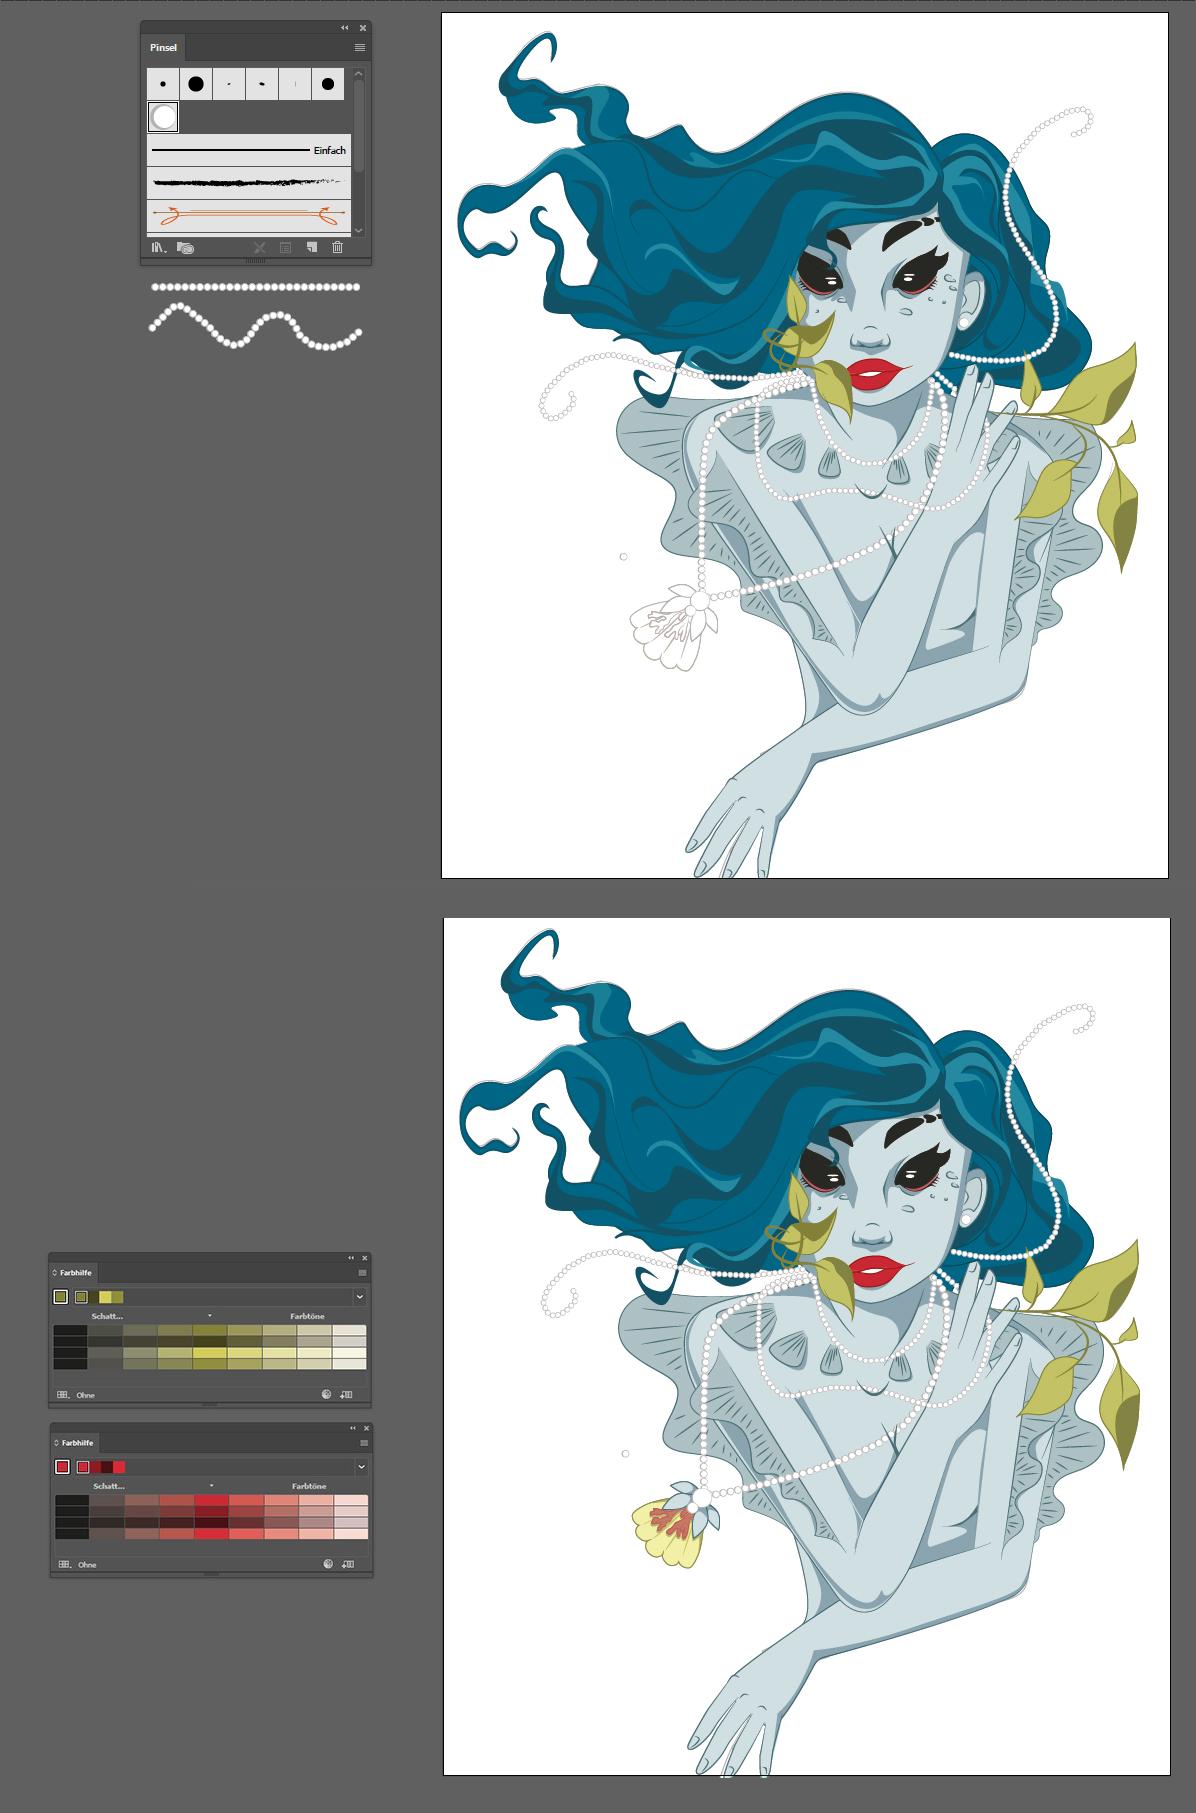 Vektorgrafiken colorieren 6